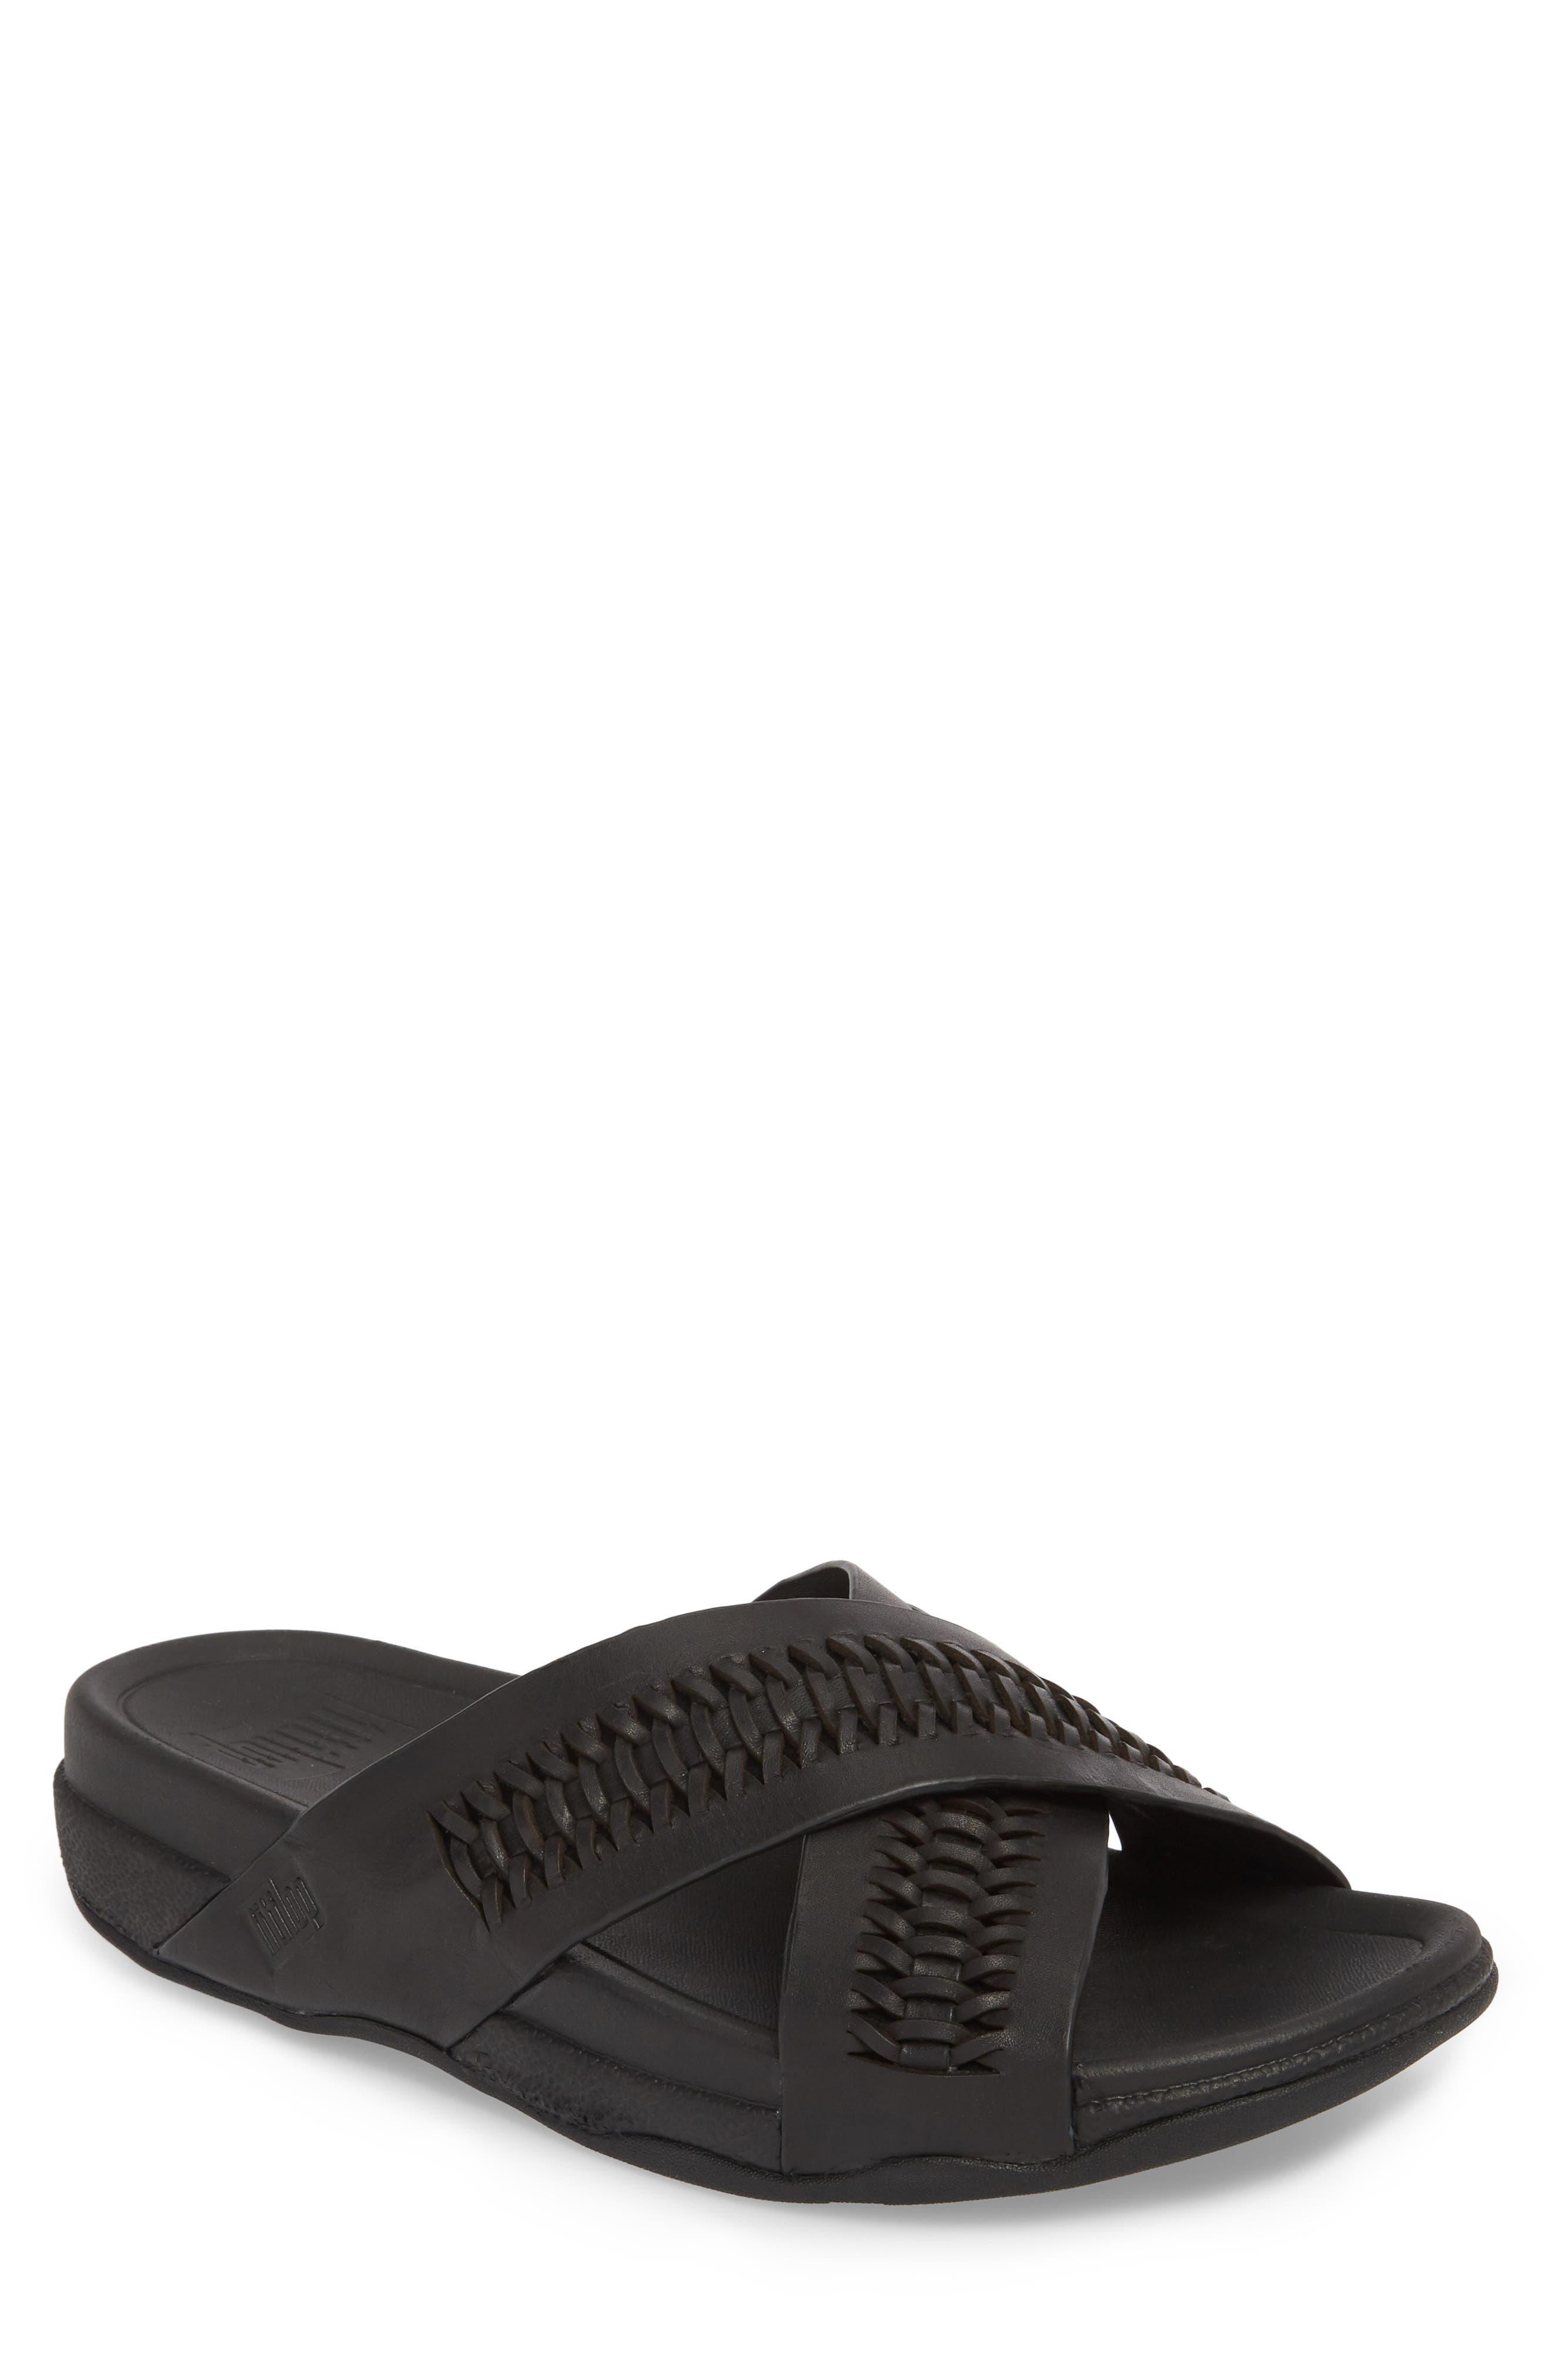 Surfer Slide Sandal,                             Main thumbnail 1, color,                             BLACK